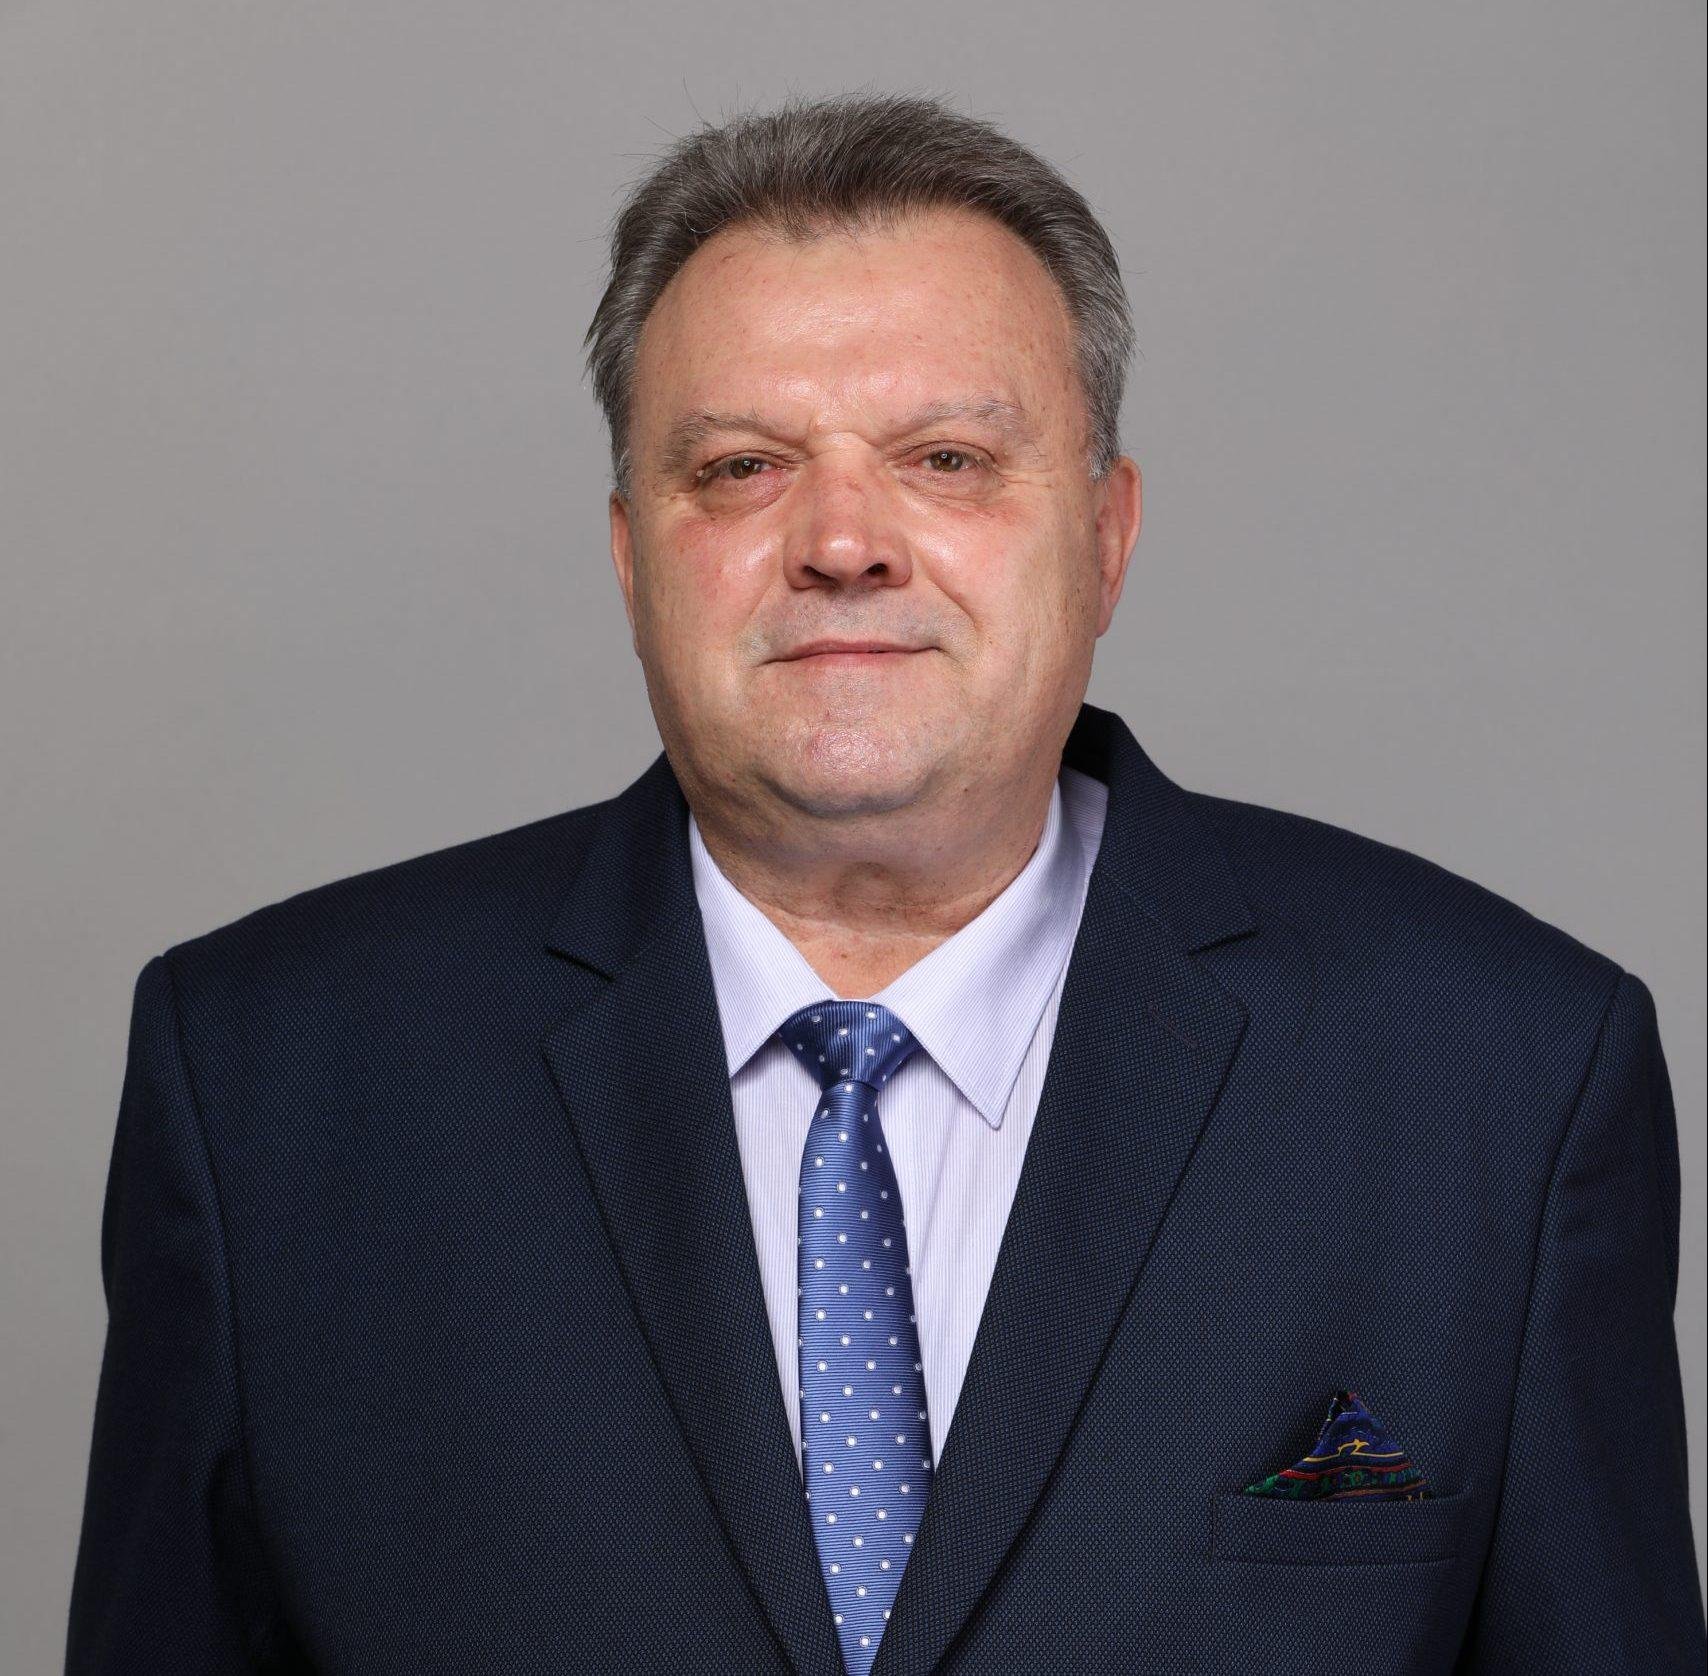 Иван Йосифов Кюркчиев